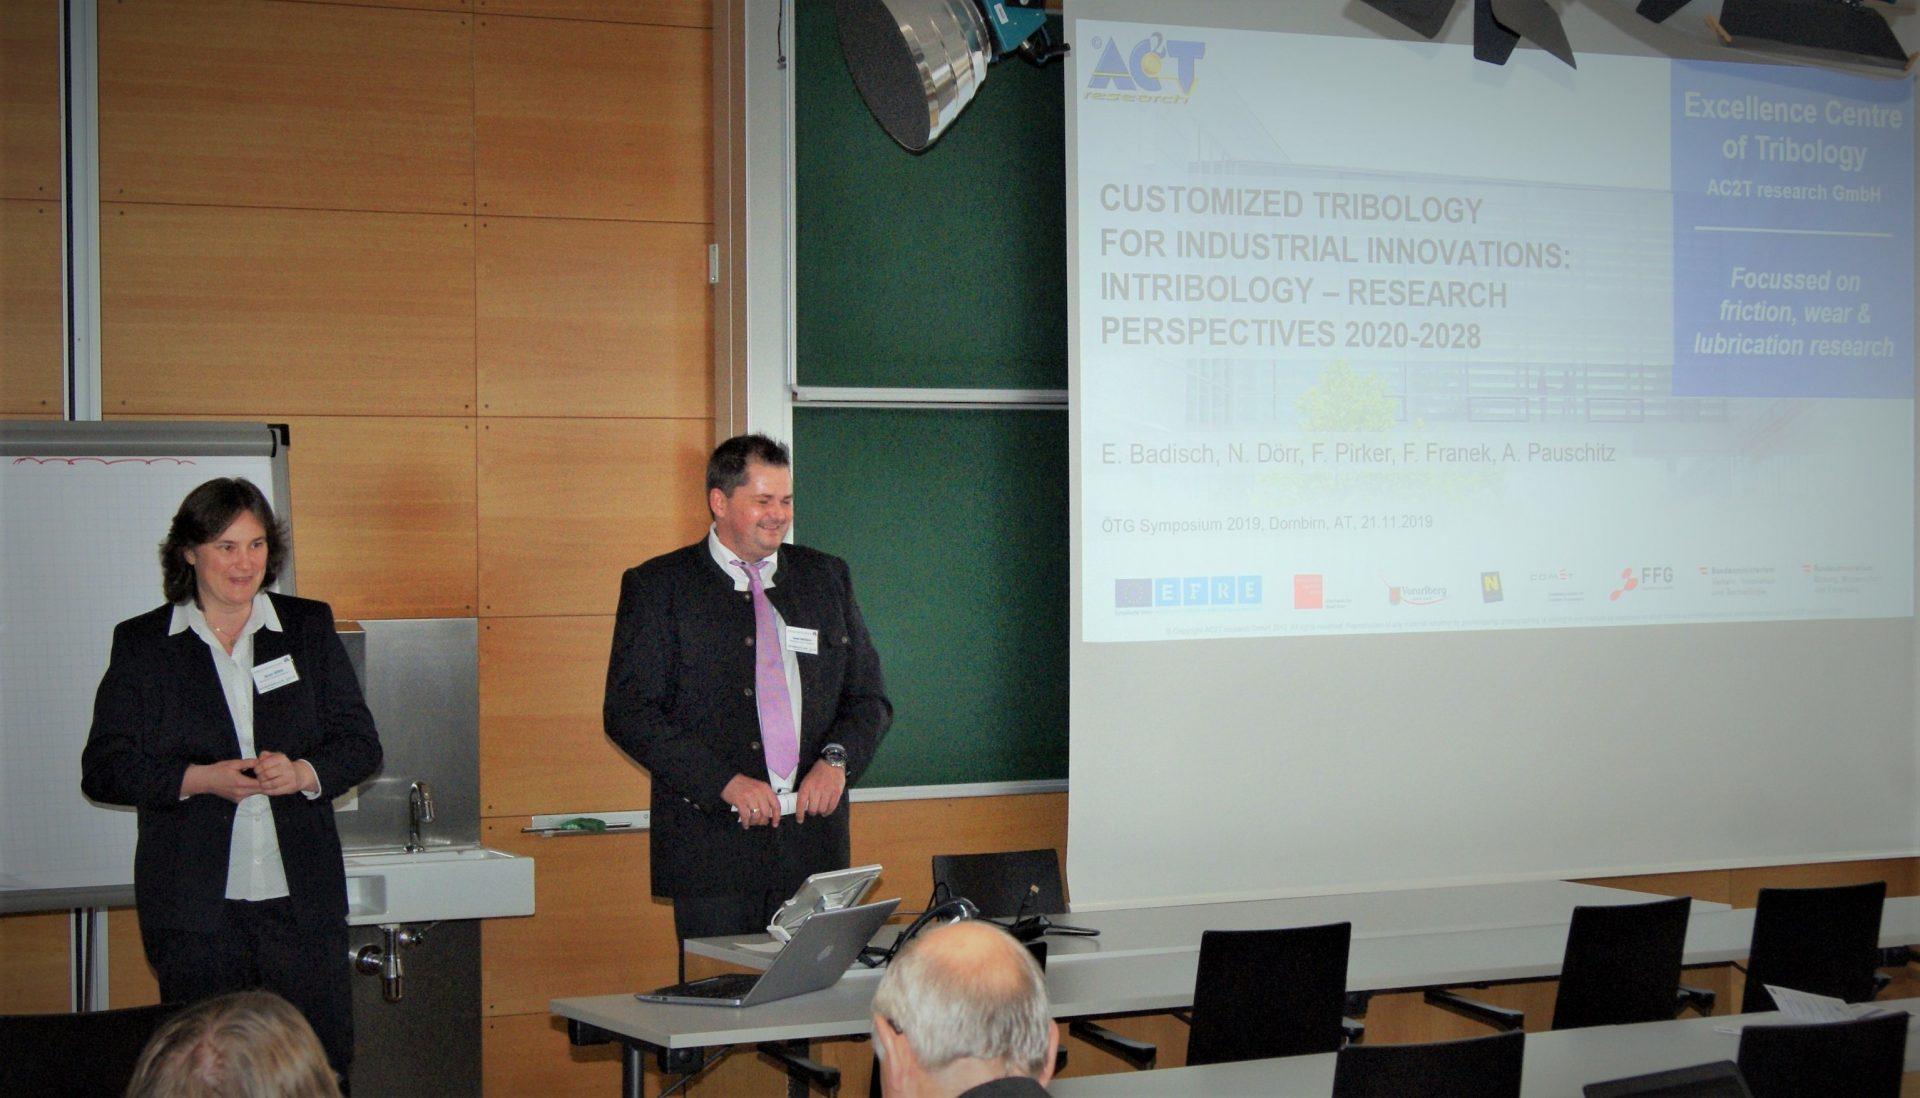 Austrian Tribology Conference (ÖTG Symposium 2019) – 21.11.2019